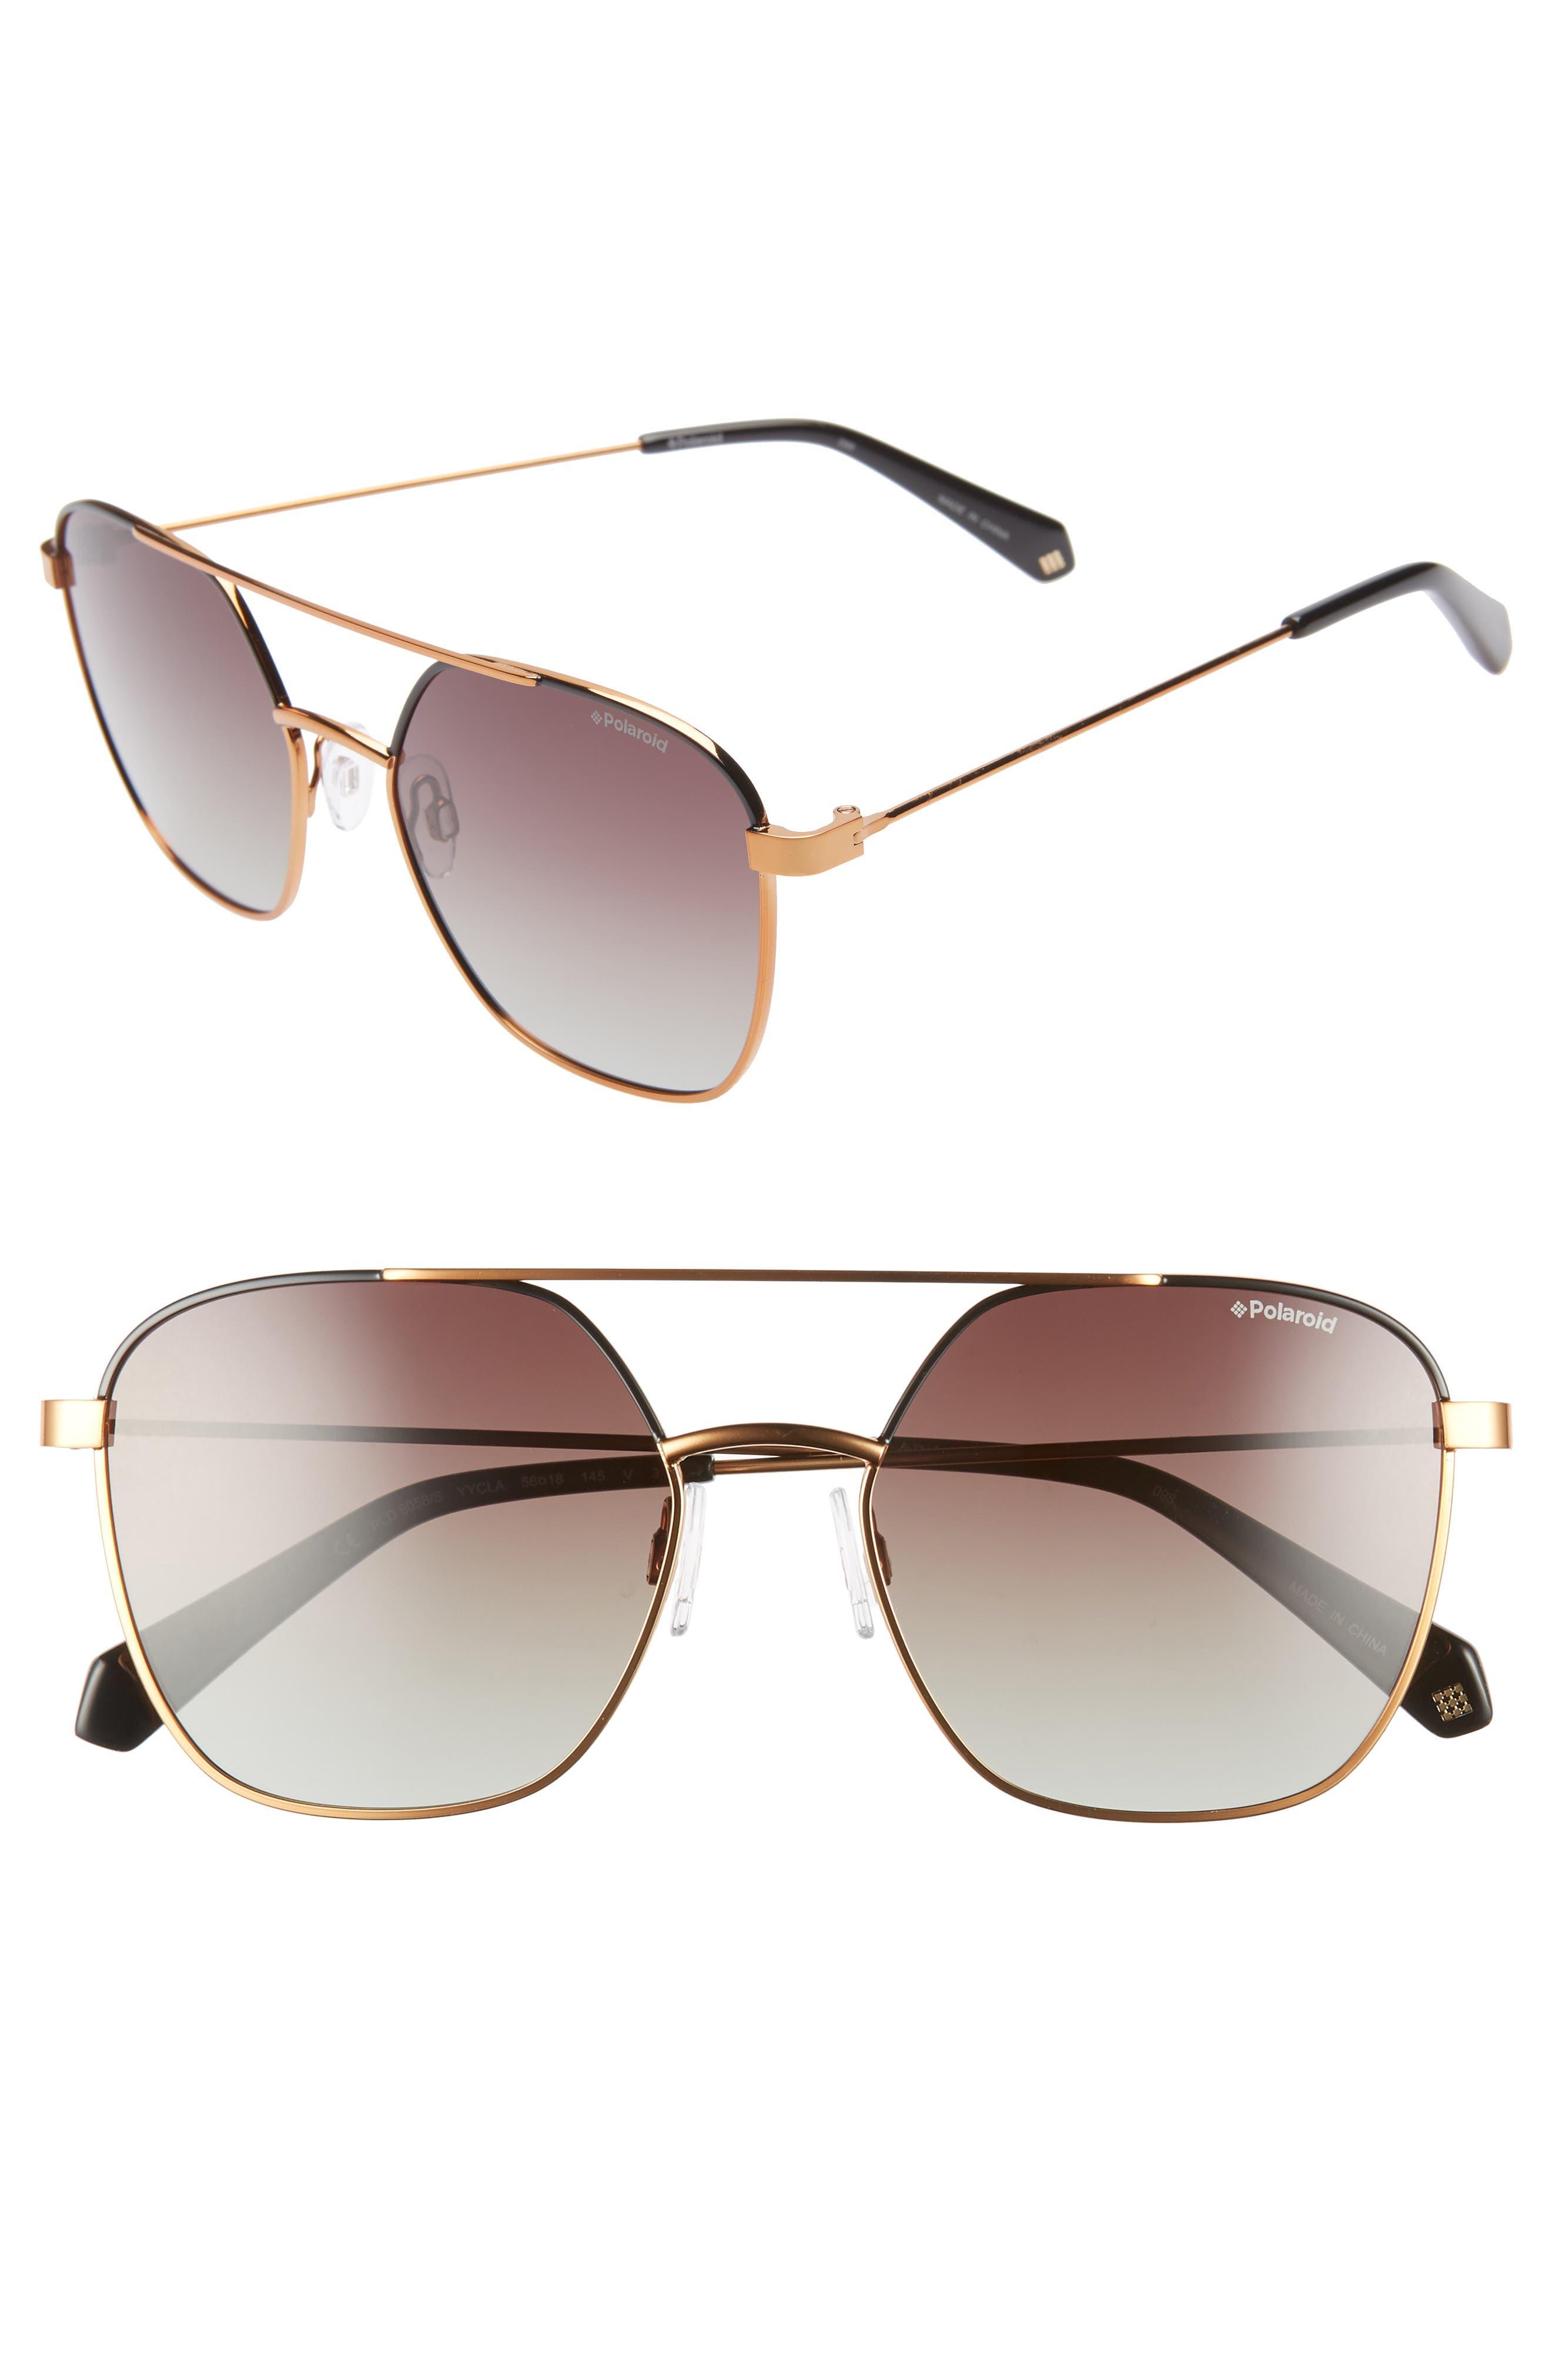 Polaroid 5m Polarized Square Aviator Sunglasses - Black Gold Bronze